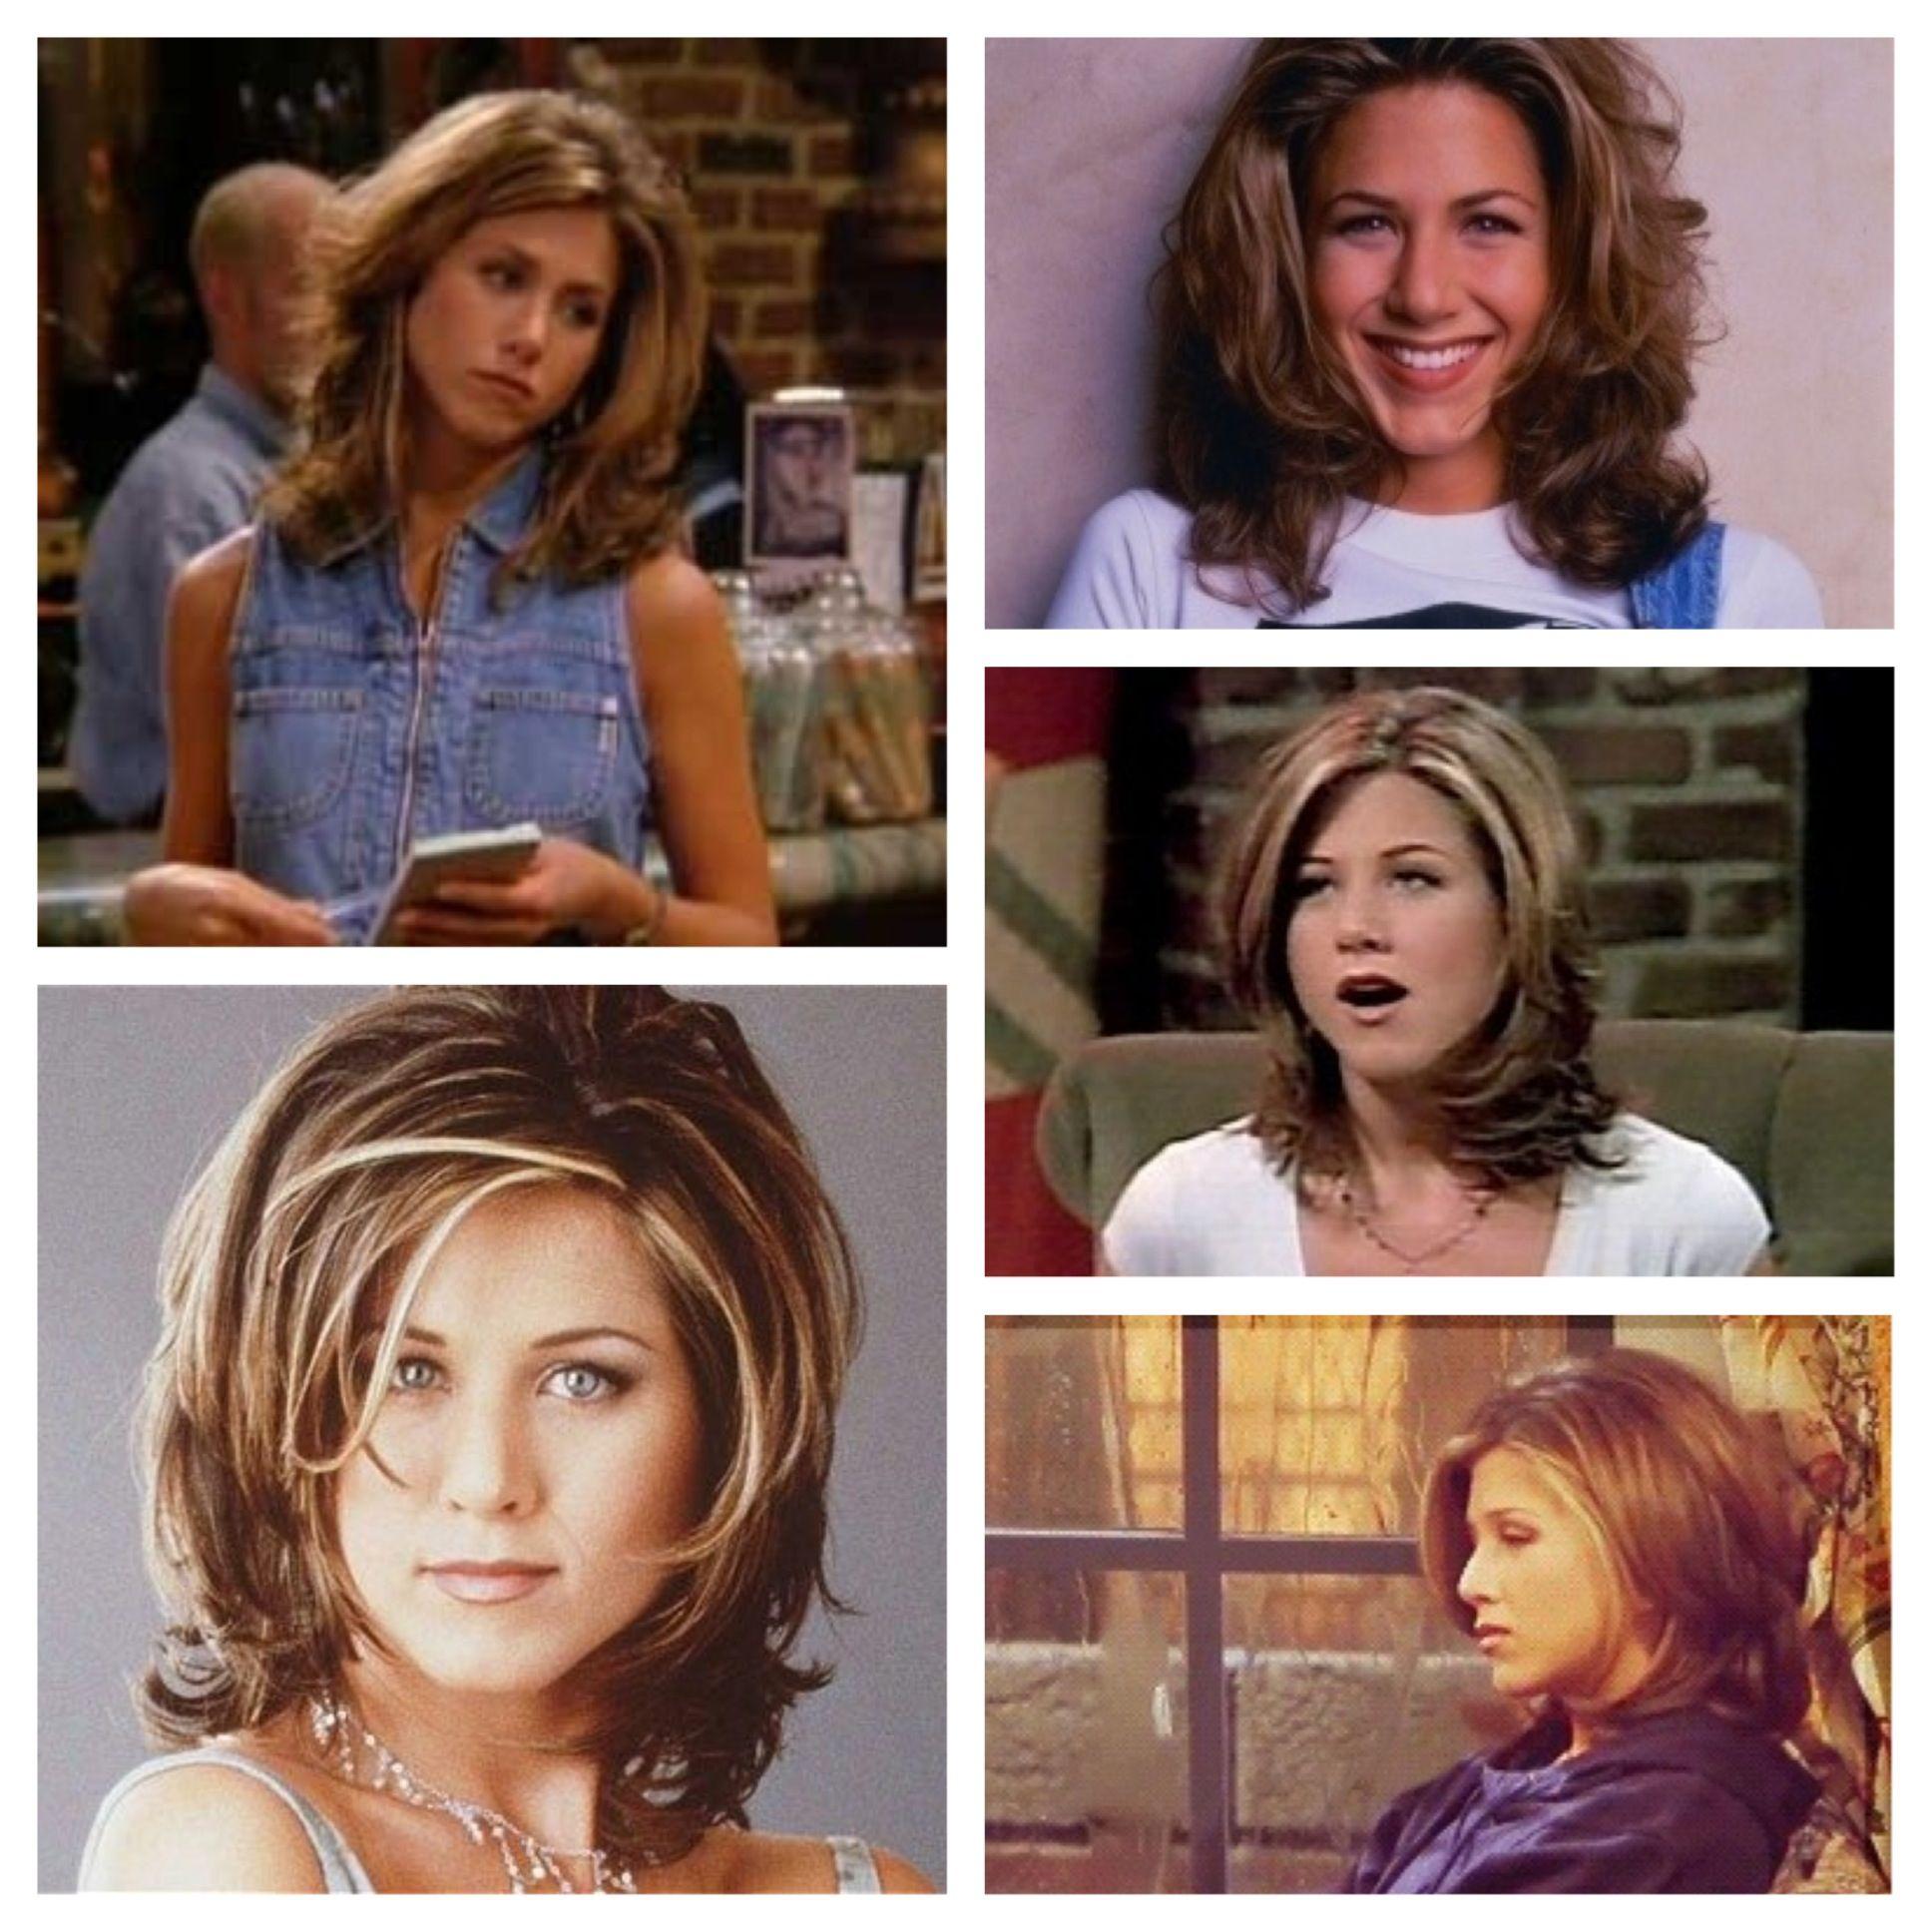 "I want the ""Rachel Green"" hair cut someday beauty"